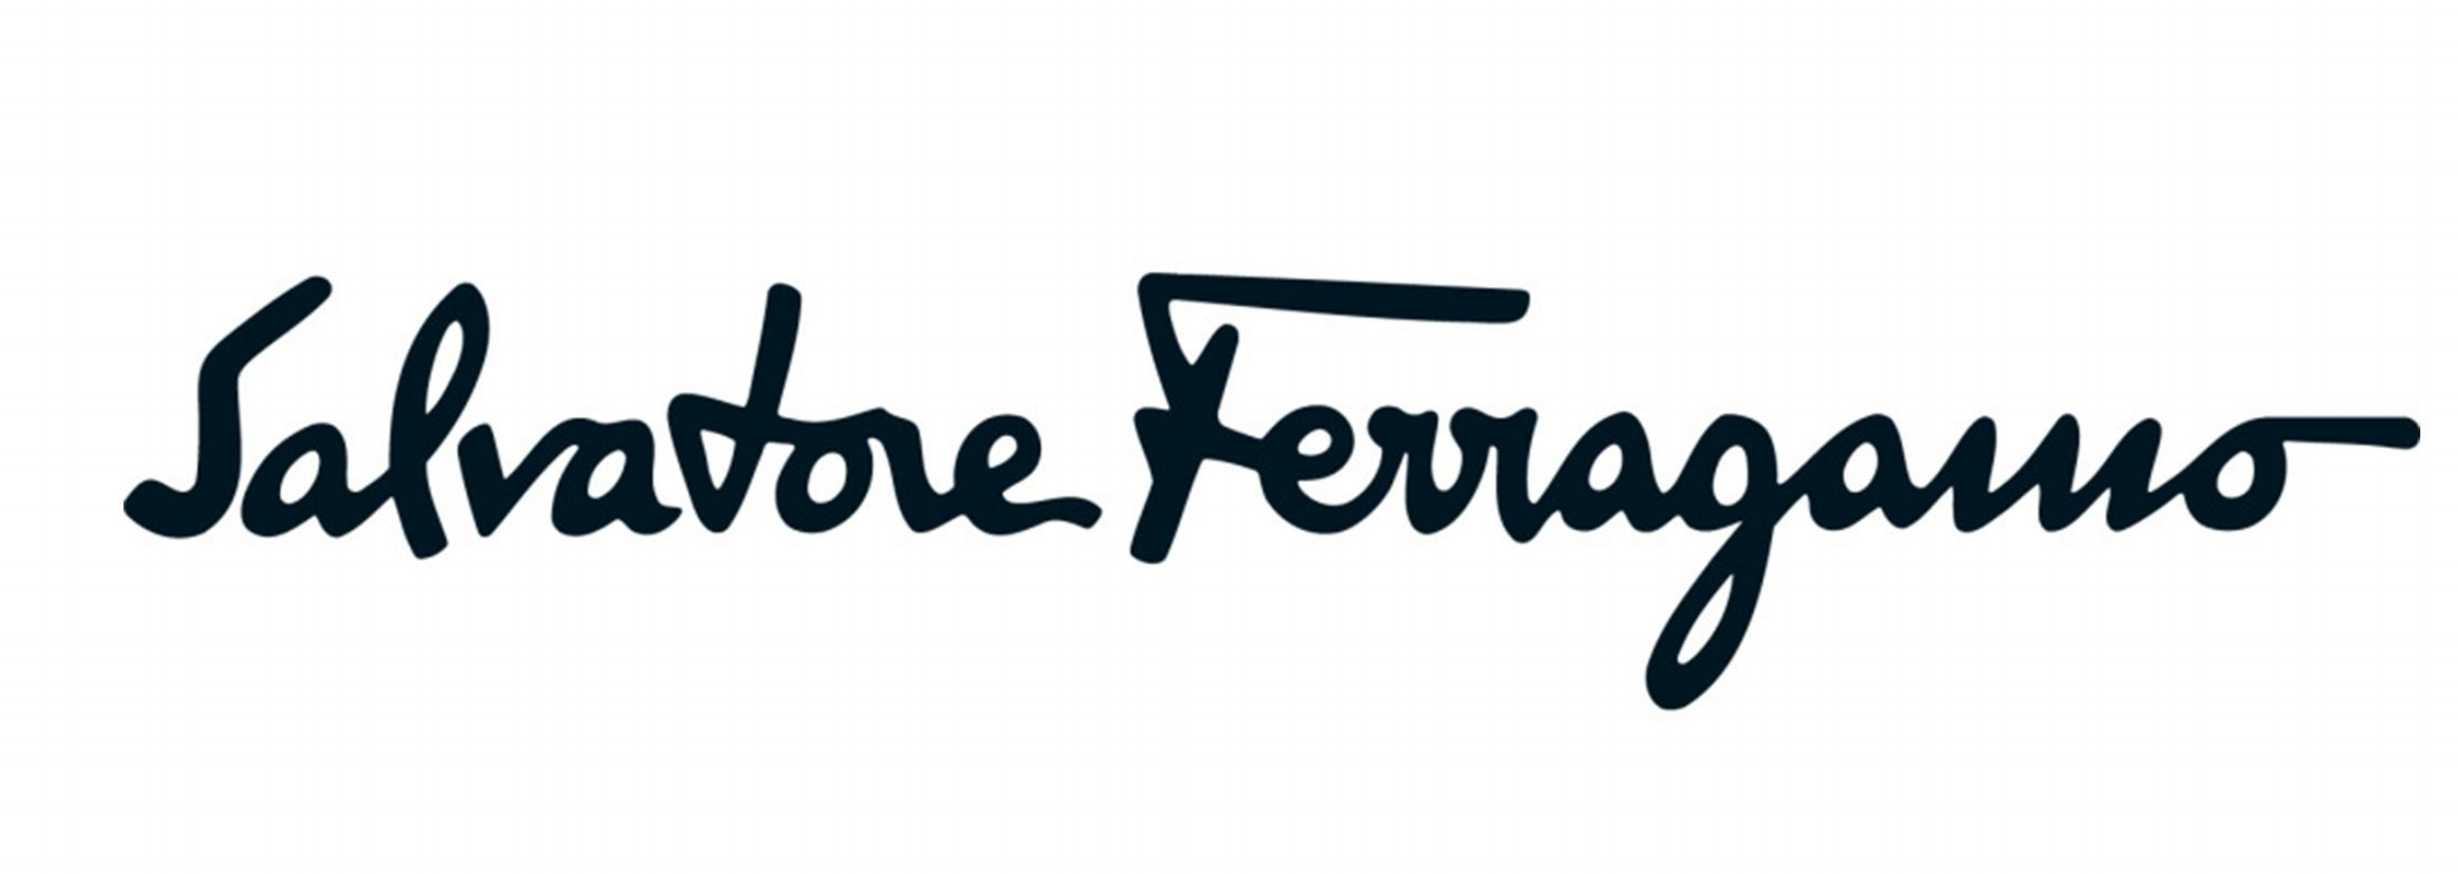 Salvatore_Ferragamo_logo.png